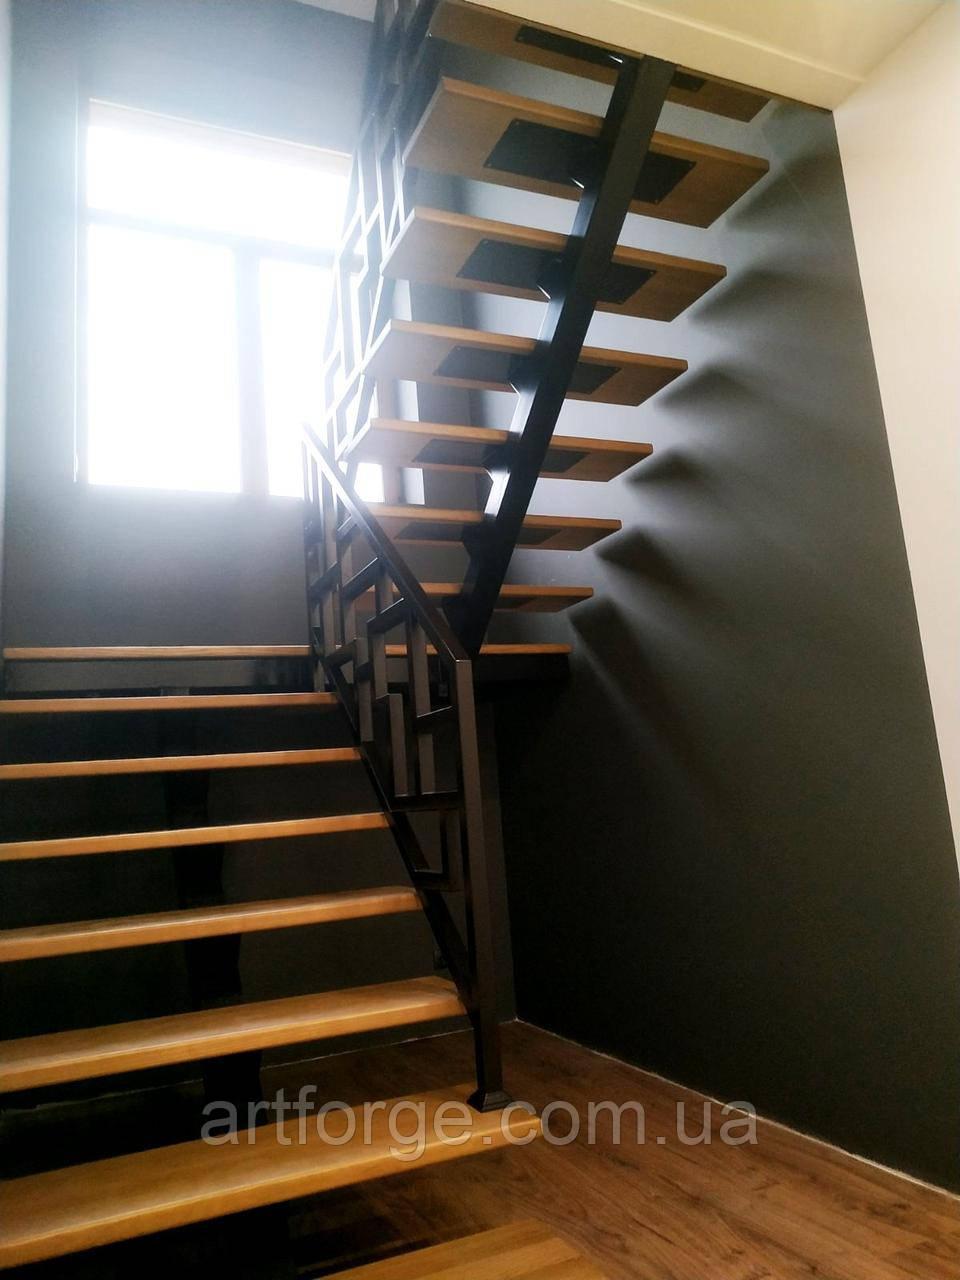 "Лестница в квартиру. Лестница для дома. Современная лестница в стиле ""Лофт"""